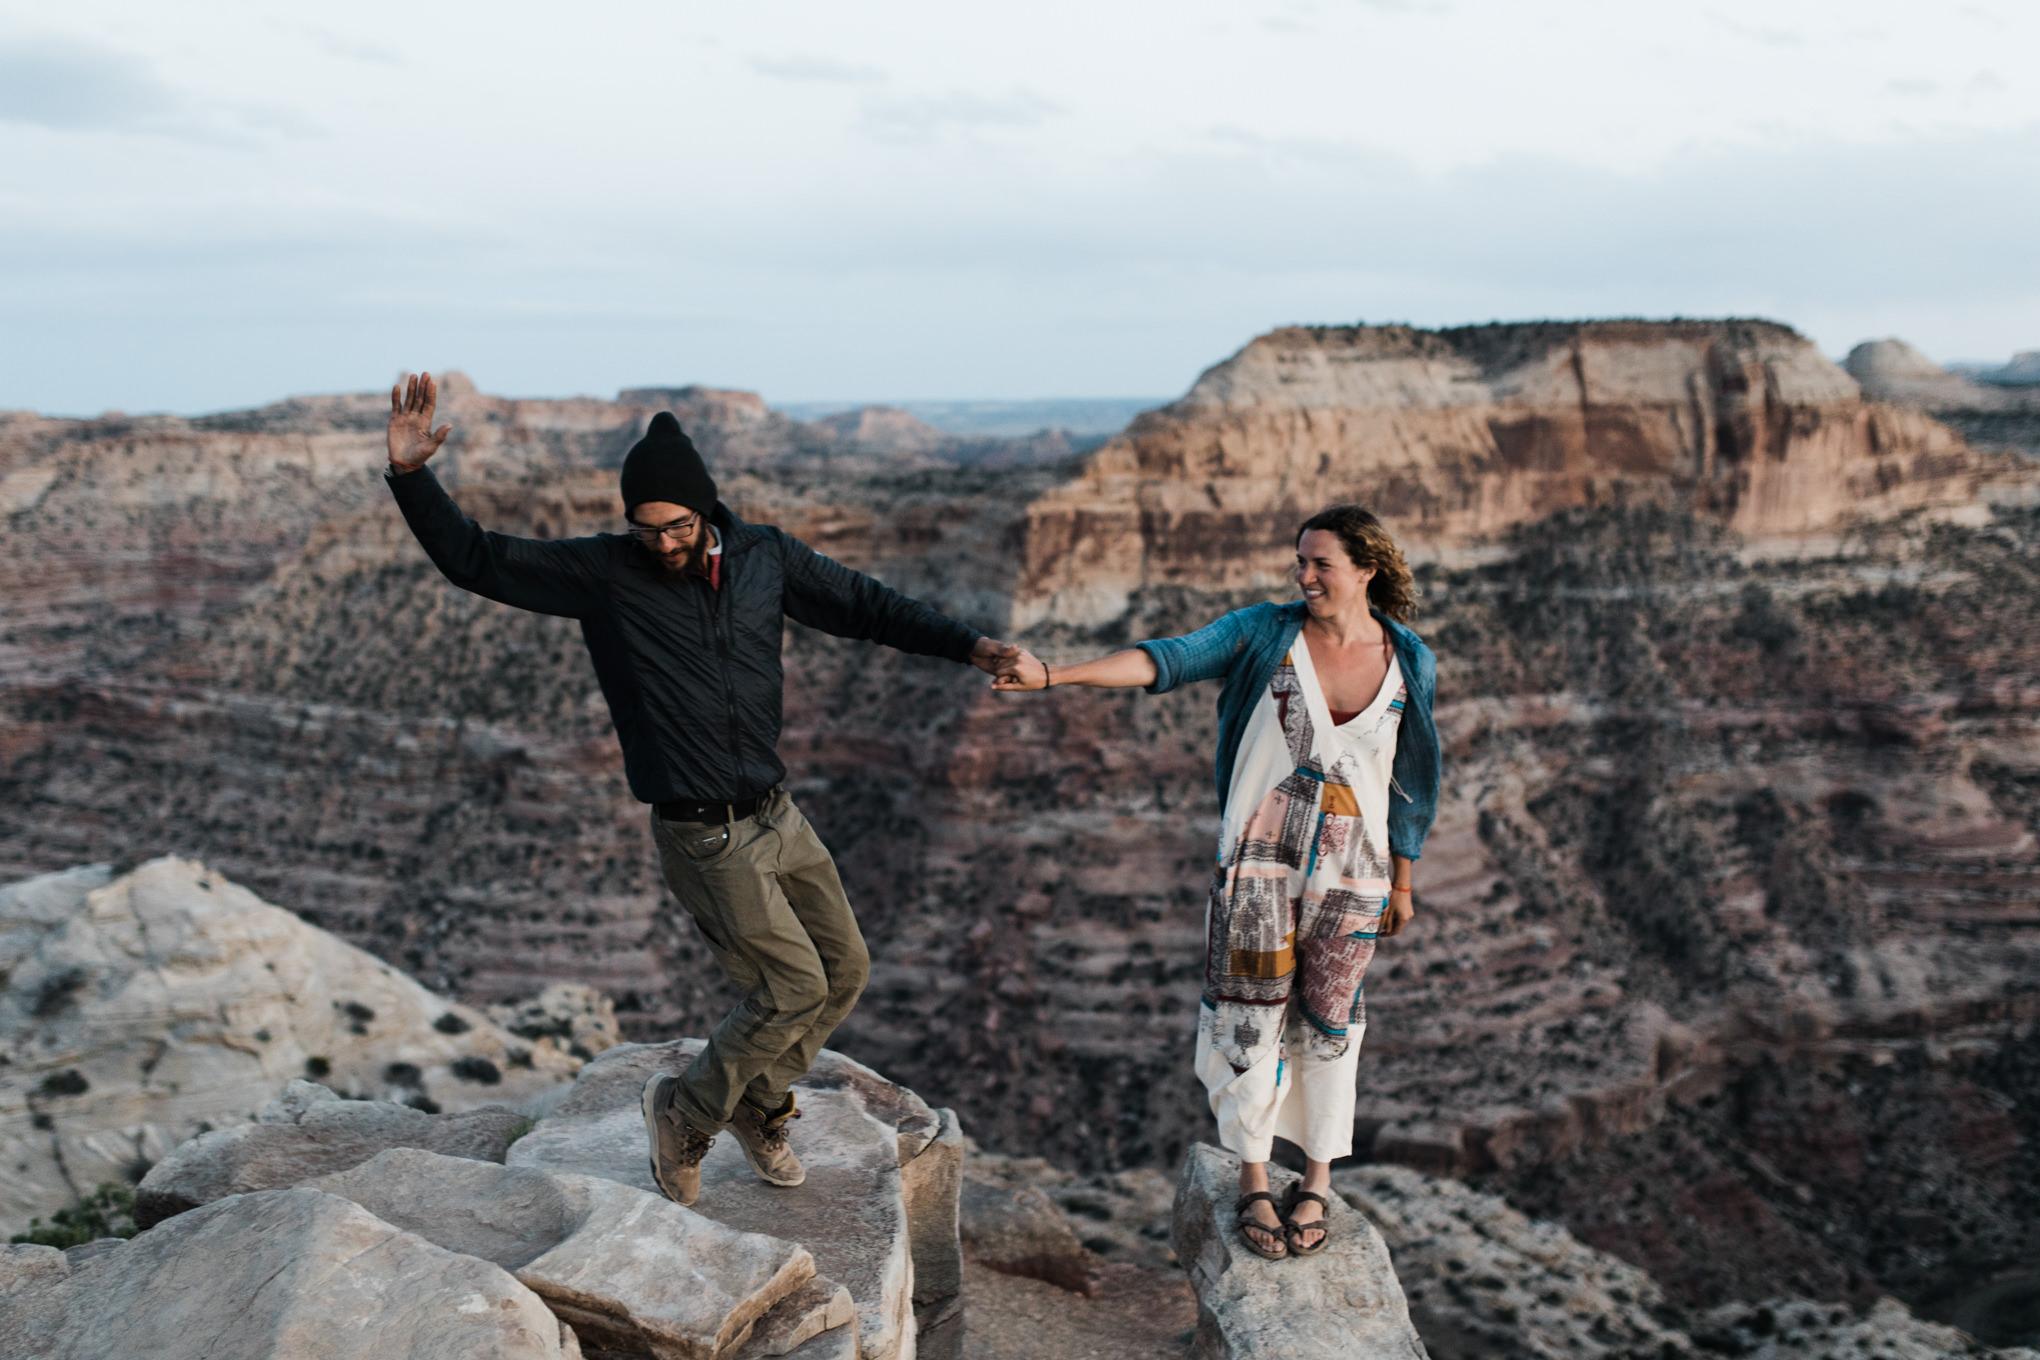 emotive van life session in the desert | destination engagement photo inspiration | utah adventure elopement photographers | the hearnes adventure photography | www.thehearnes.com